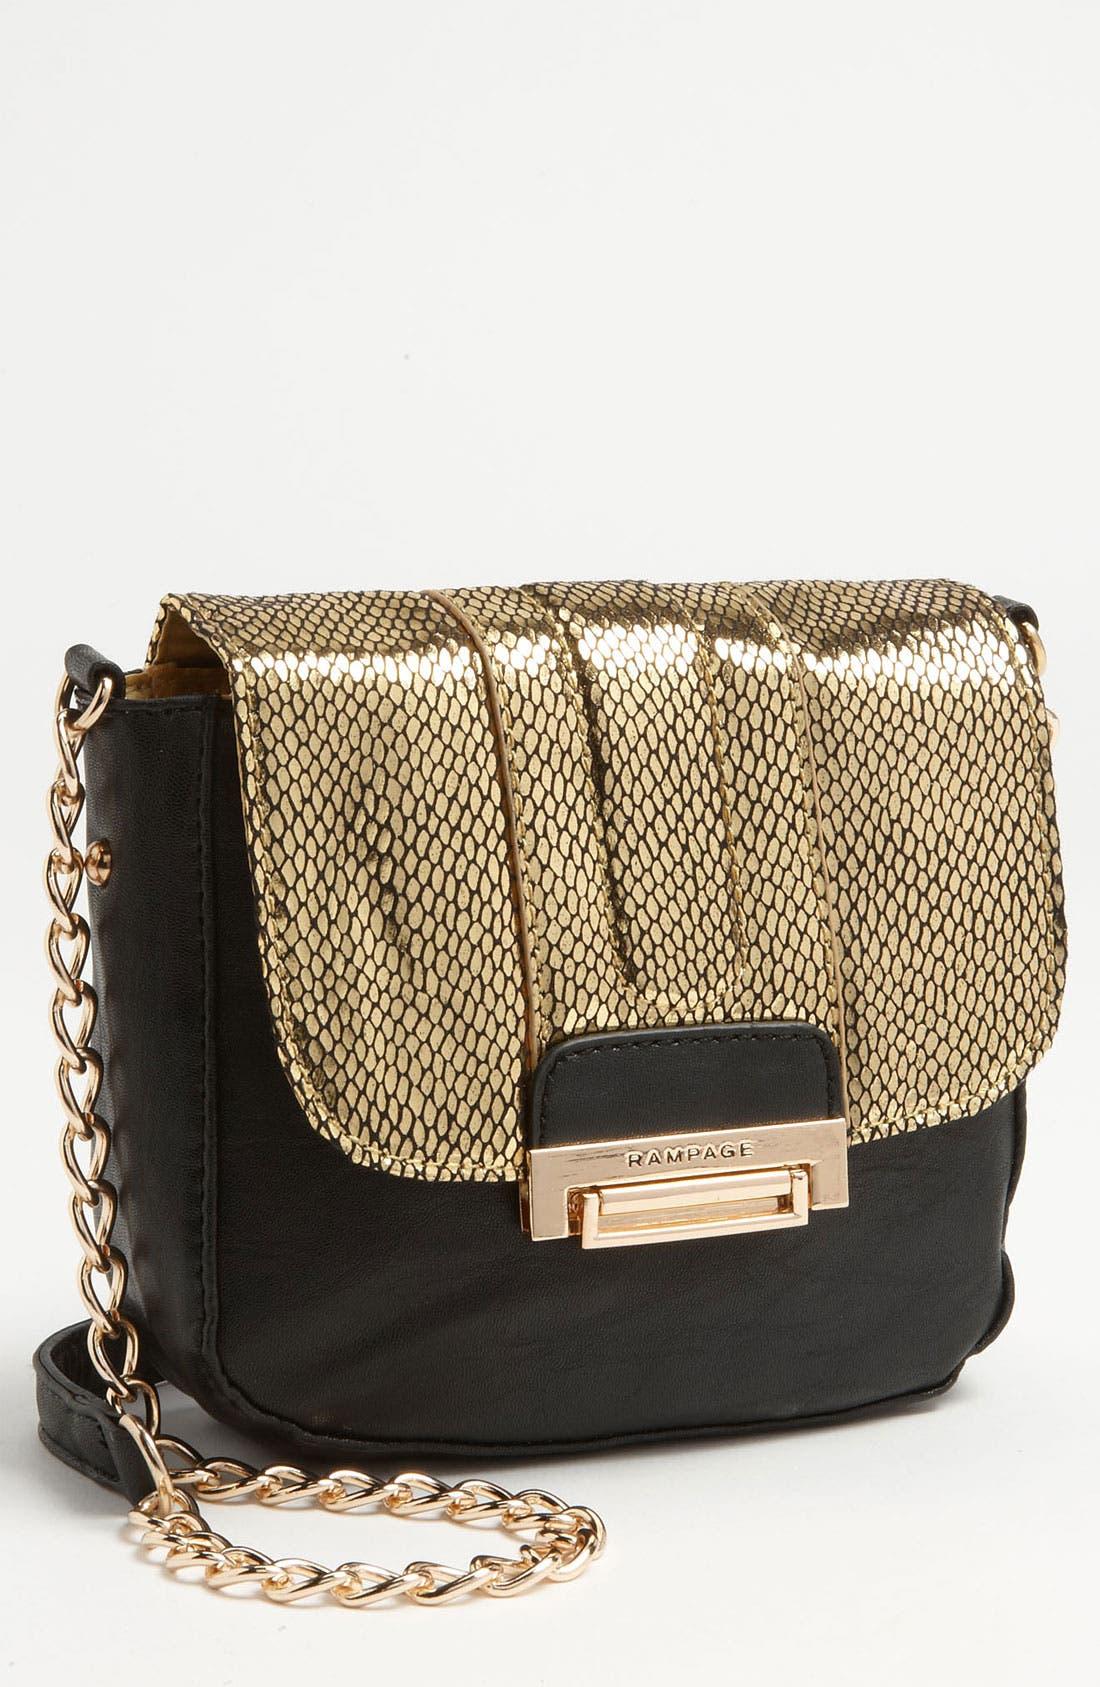 Alternate Image 1 Selected - Rampage 'Lillian' Crossbody Bag